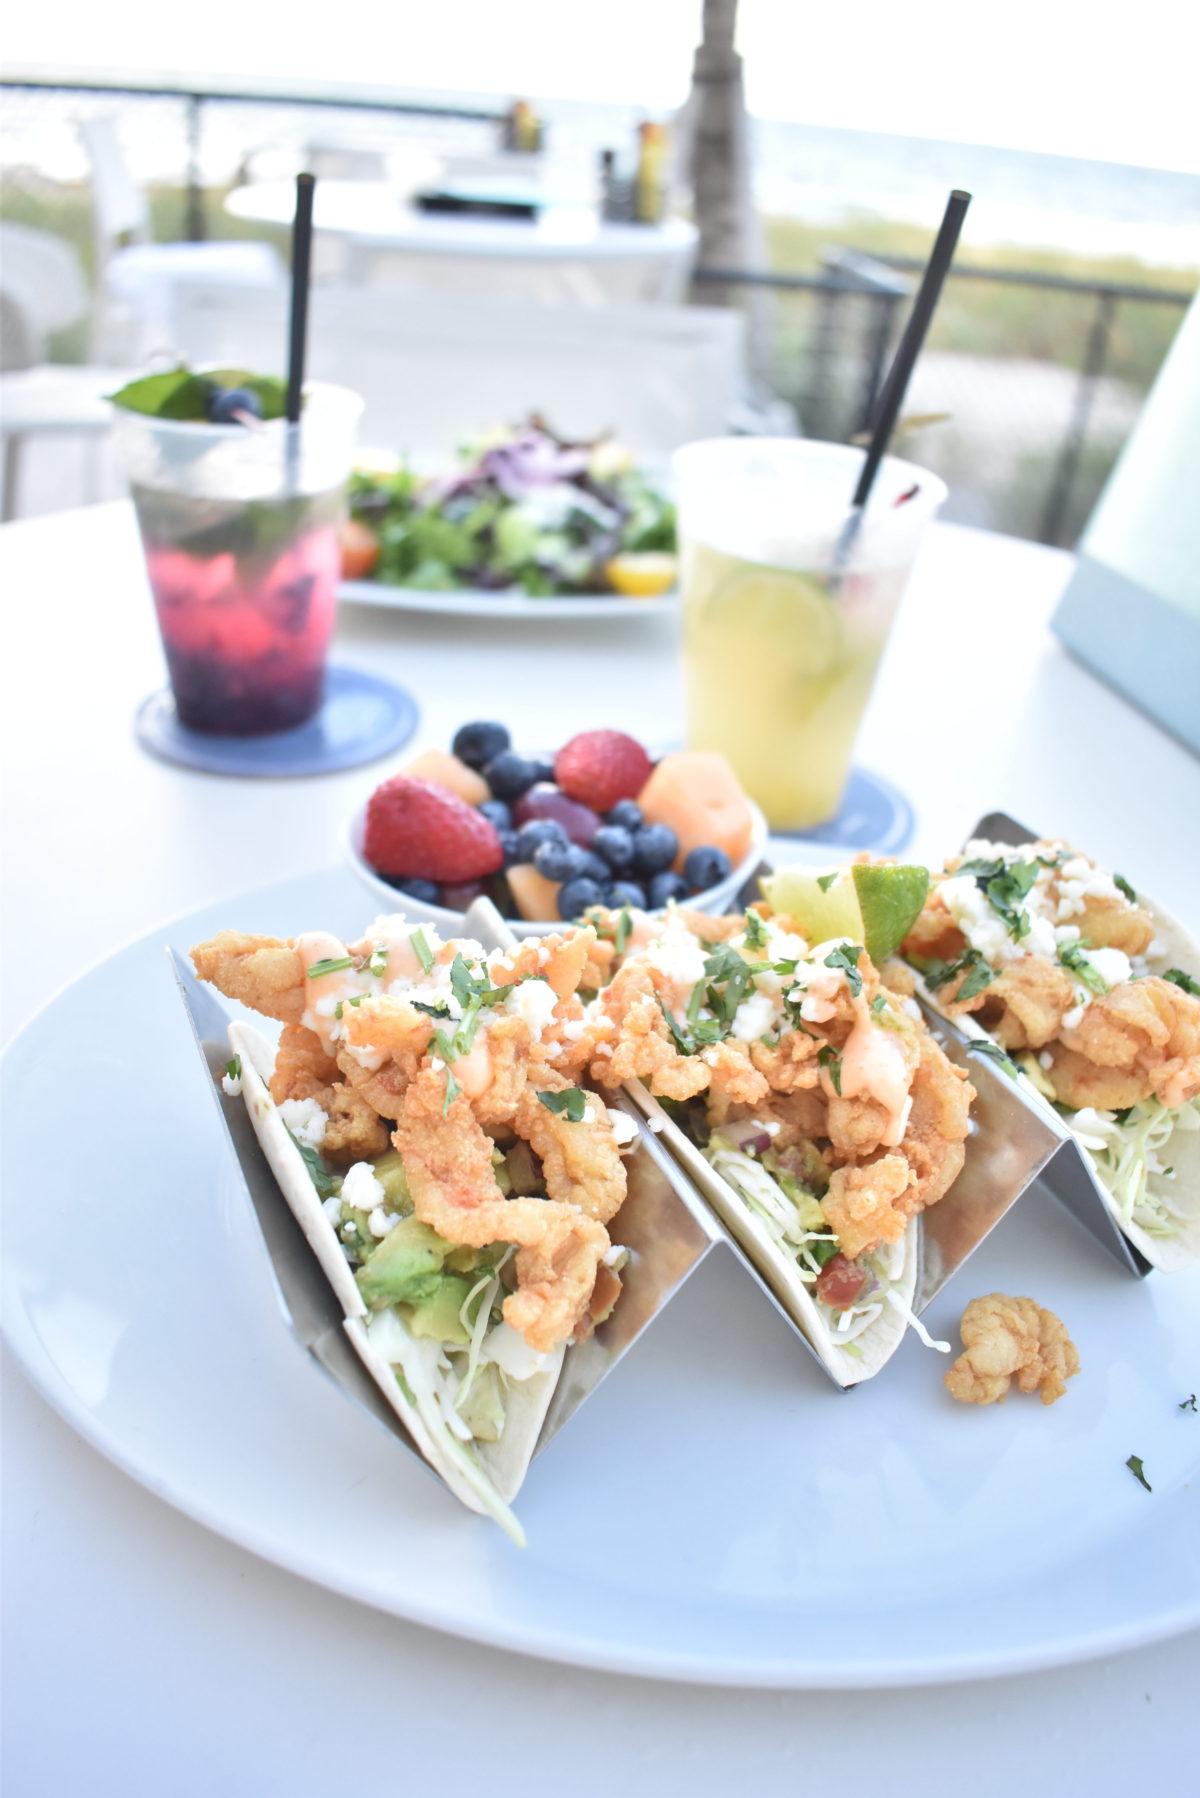 Hutchinson Shores - 30A Mama Travel - Tacos